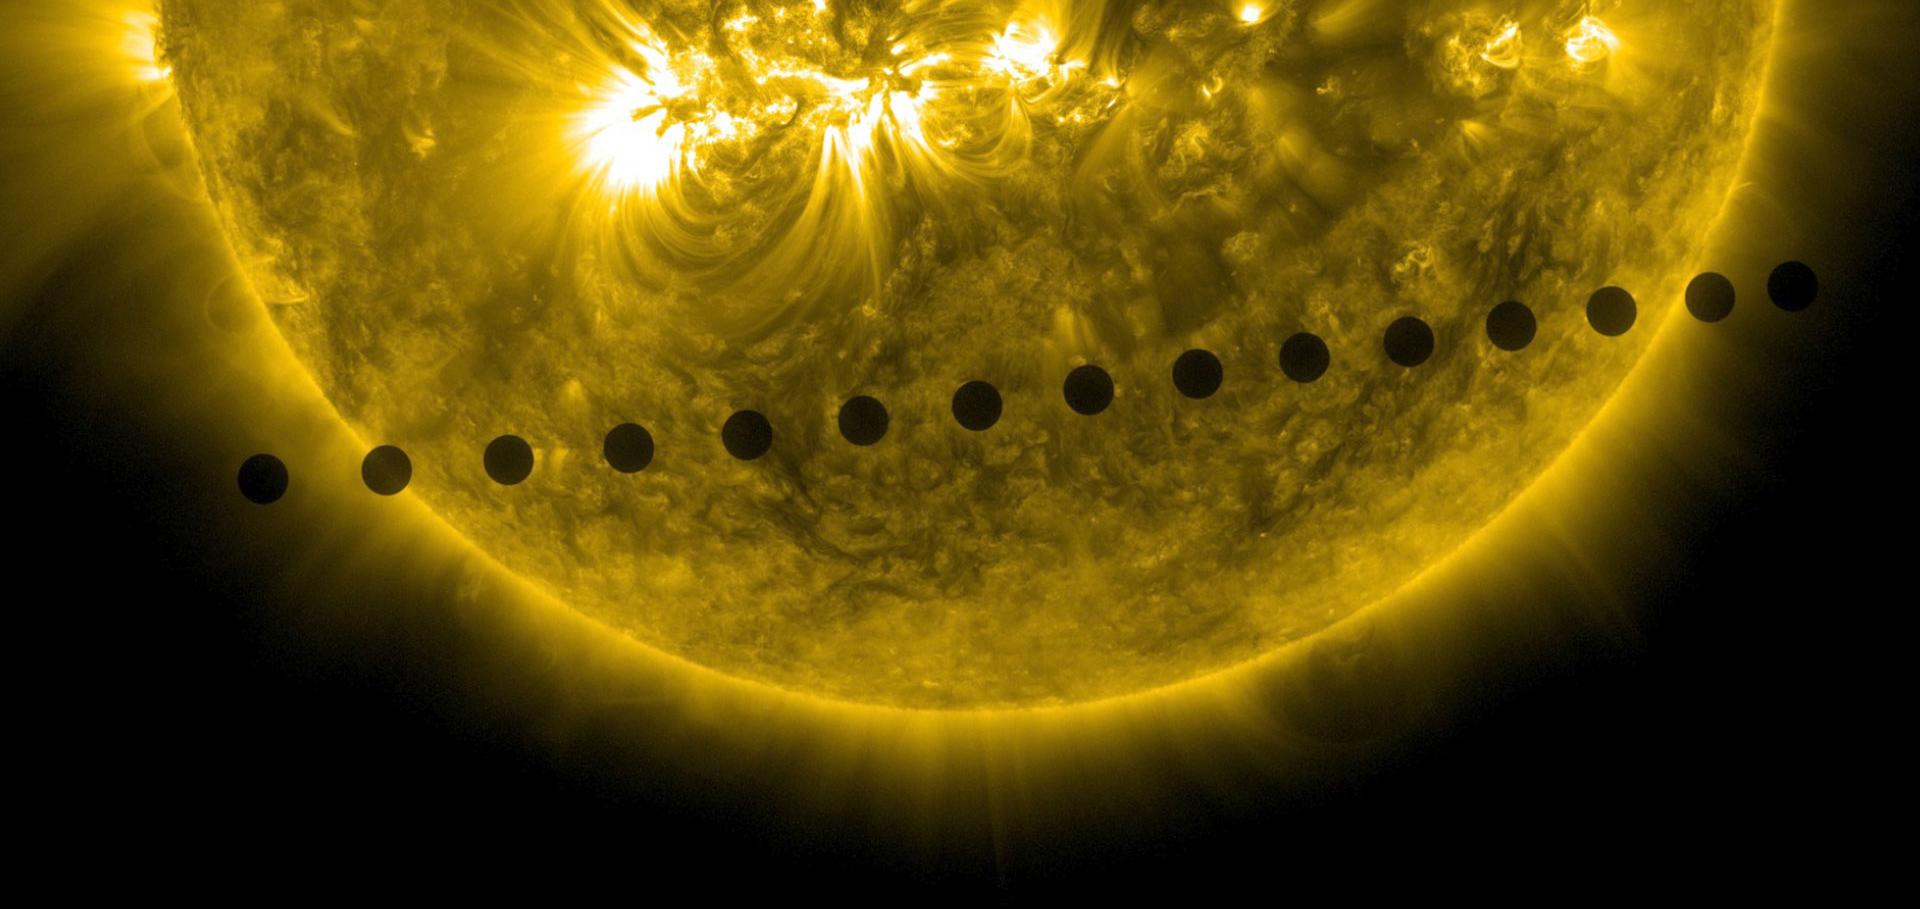 Venus transit across the Sun (2014)